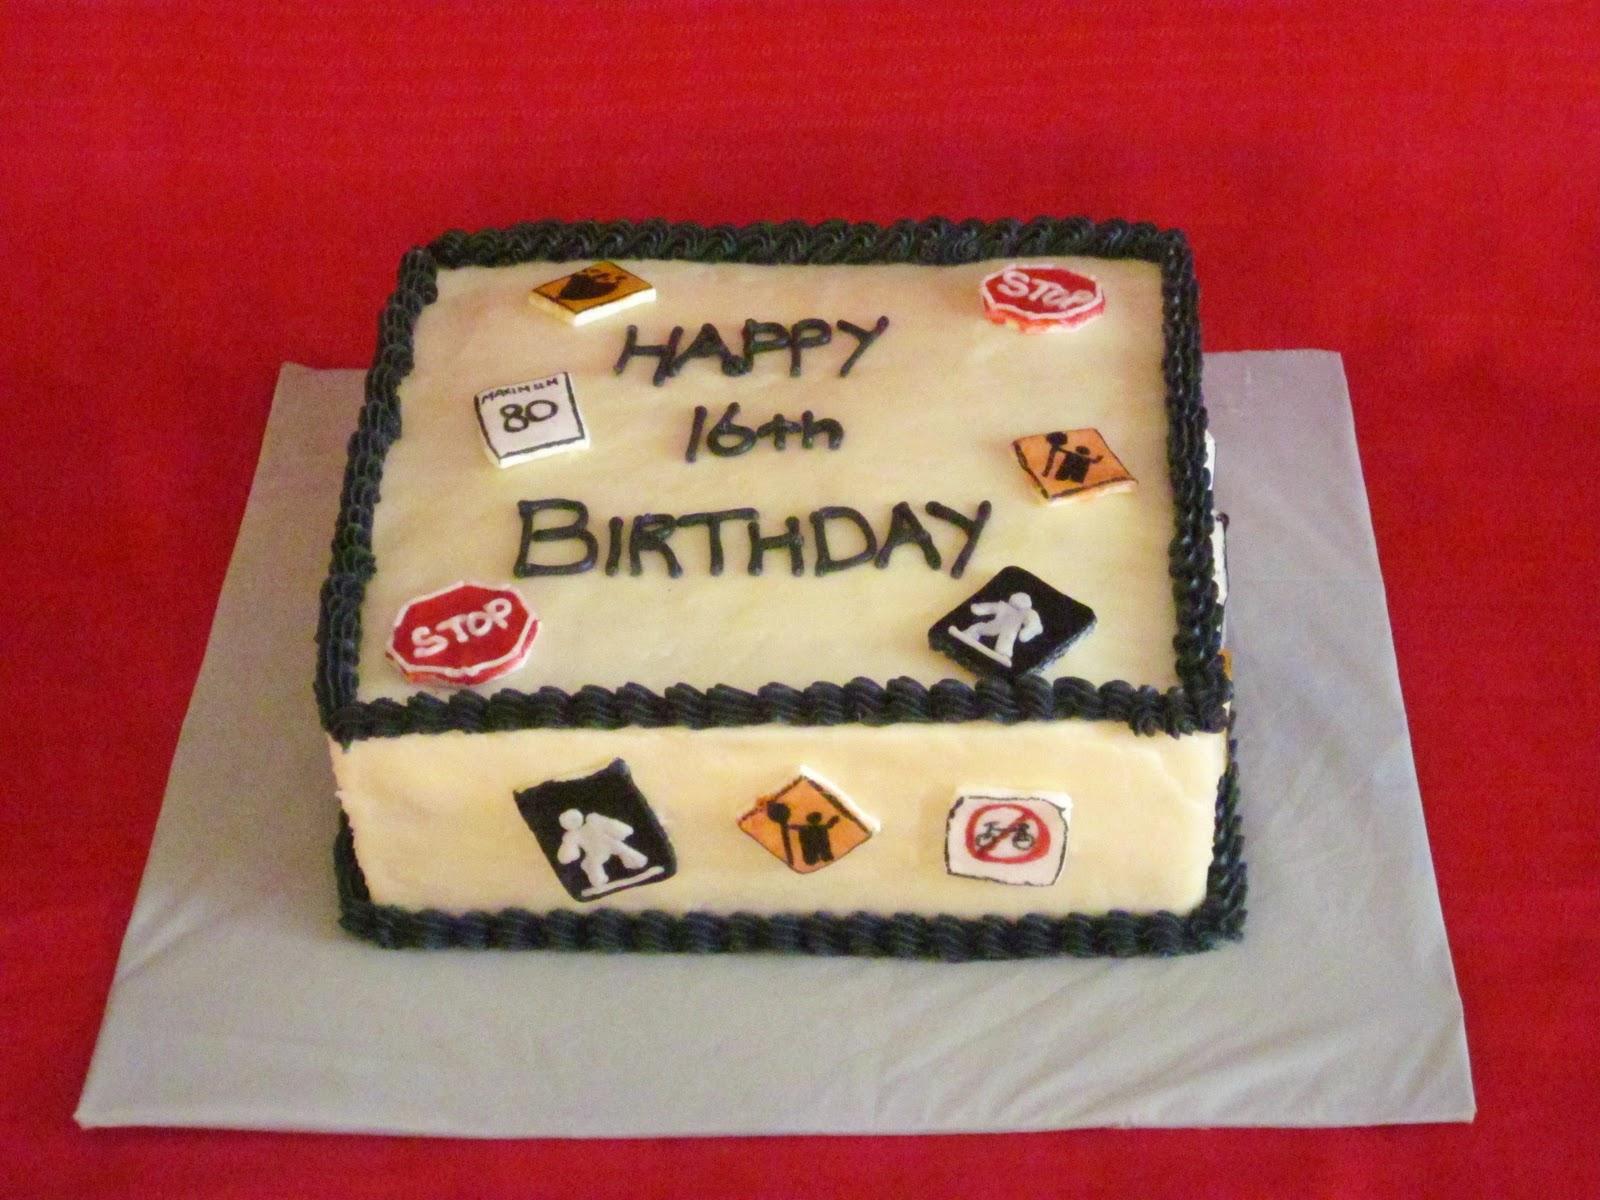 Second Generation Cake Design Traffic Sign 16th Birthday Cake